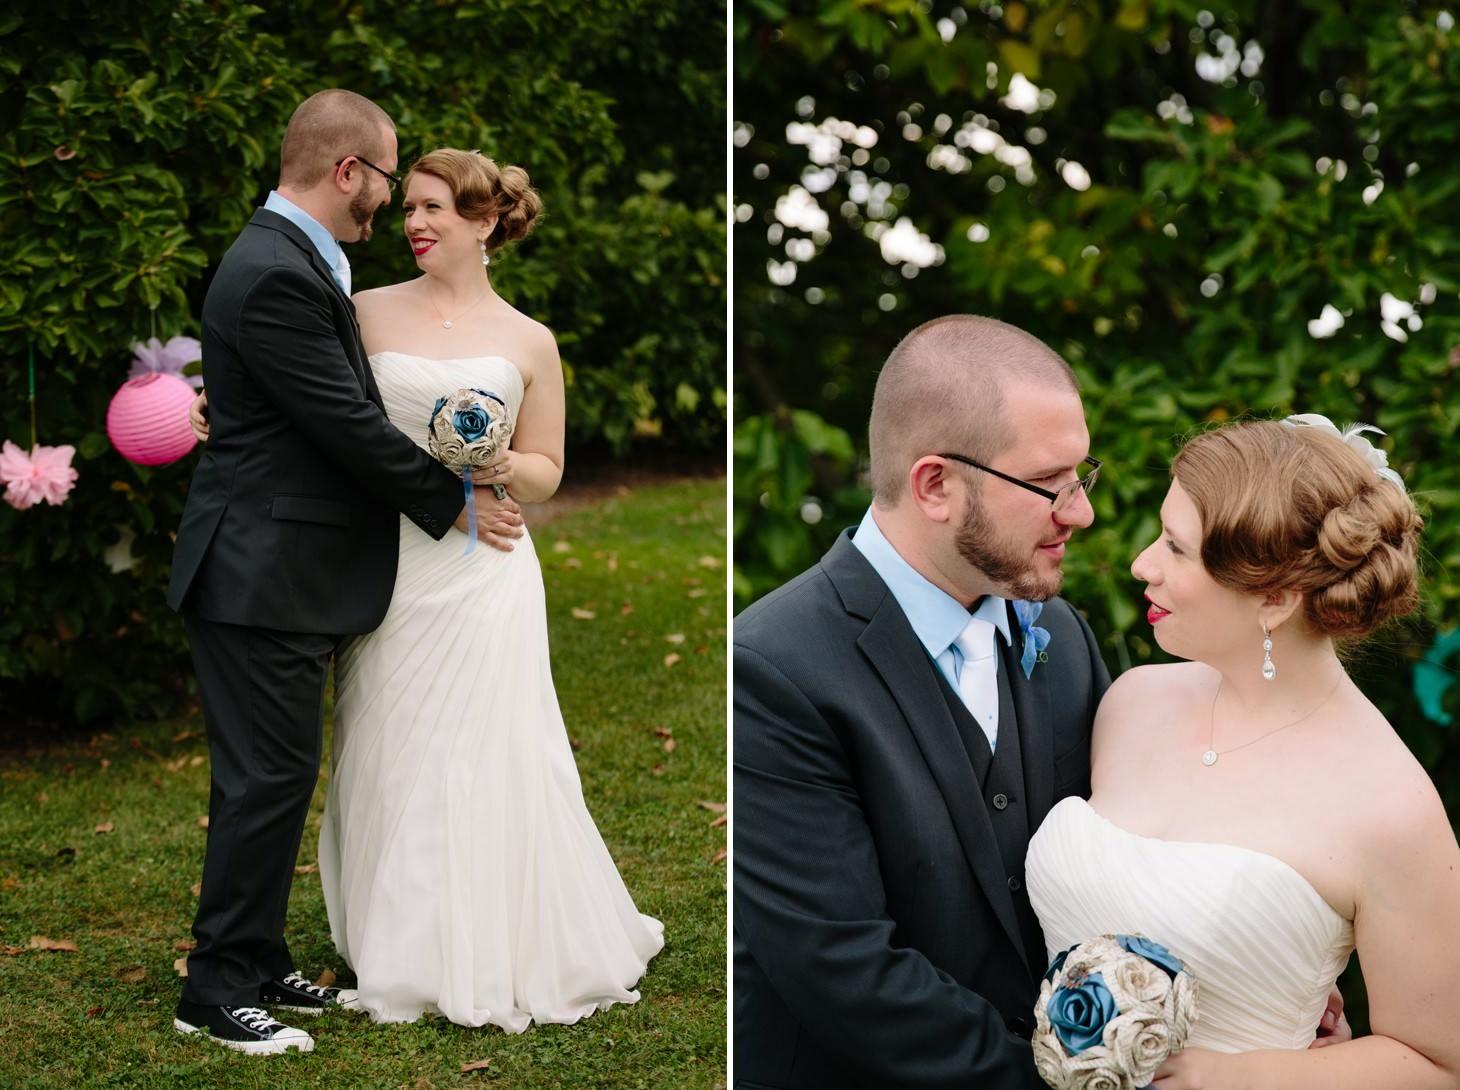 020-nyc-wedding-photographer-nj-nerdy-dr-who-firehouse-wedding-smitten-chickens.jpg